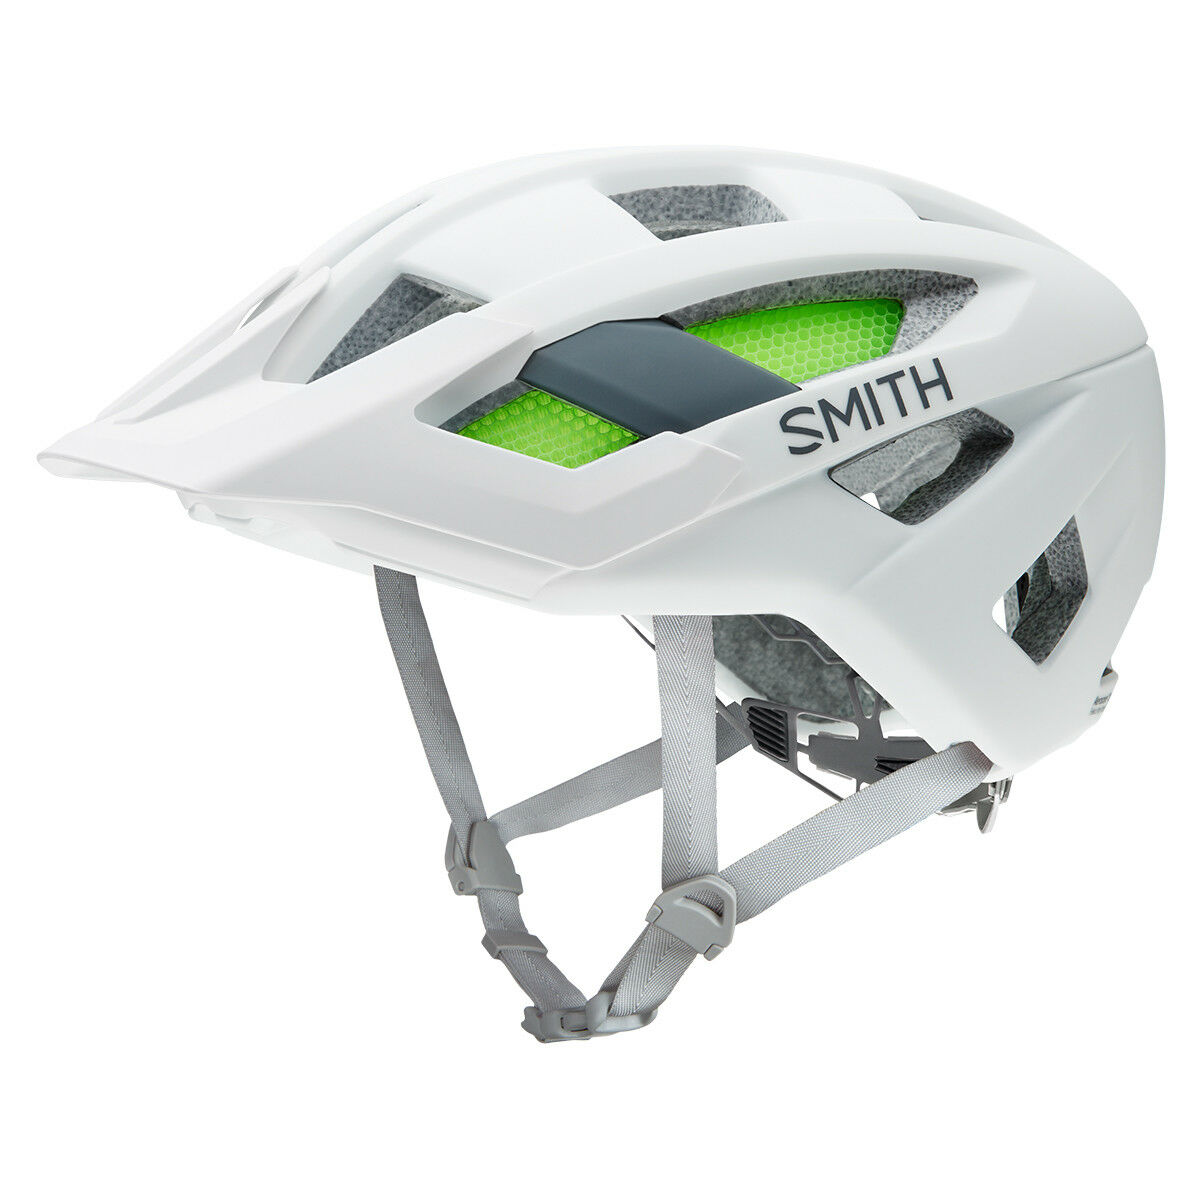 Smith  Rover Mountain Bike MTB Cyclisme Vélo Casque Mat white M 55-59cm  we offer various famous brand